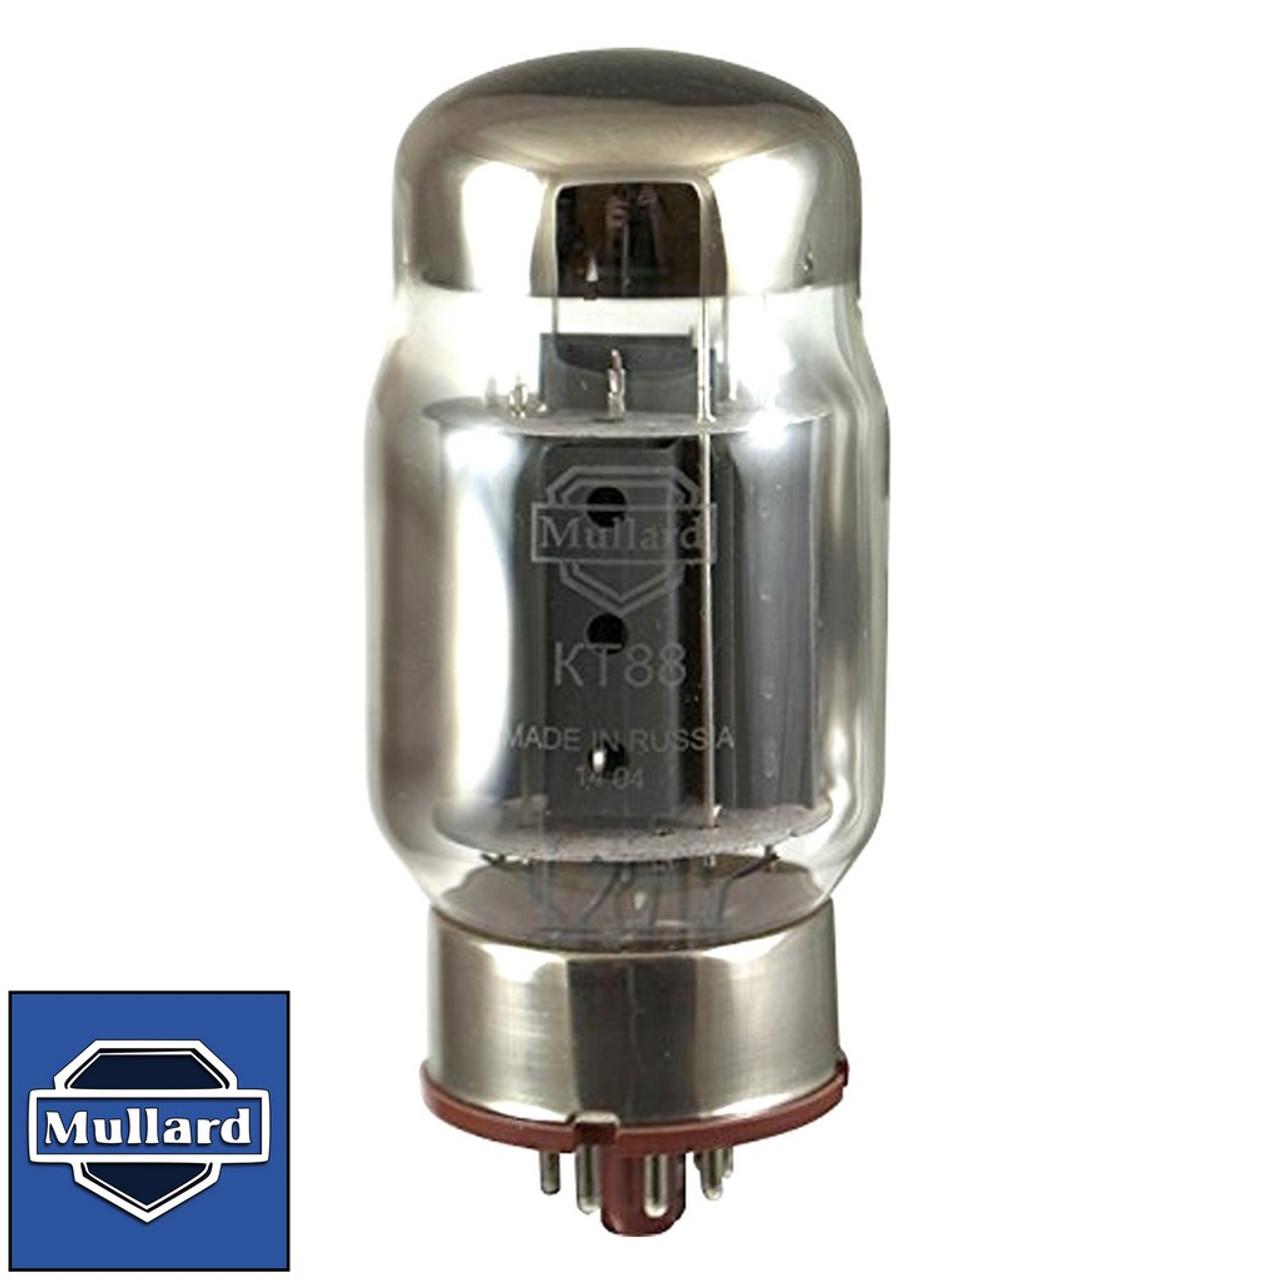 Brand New Plate Current Tested Mullard Reissue KT88 / 6550 Vacuum Tube